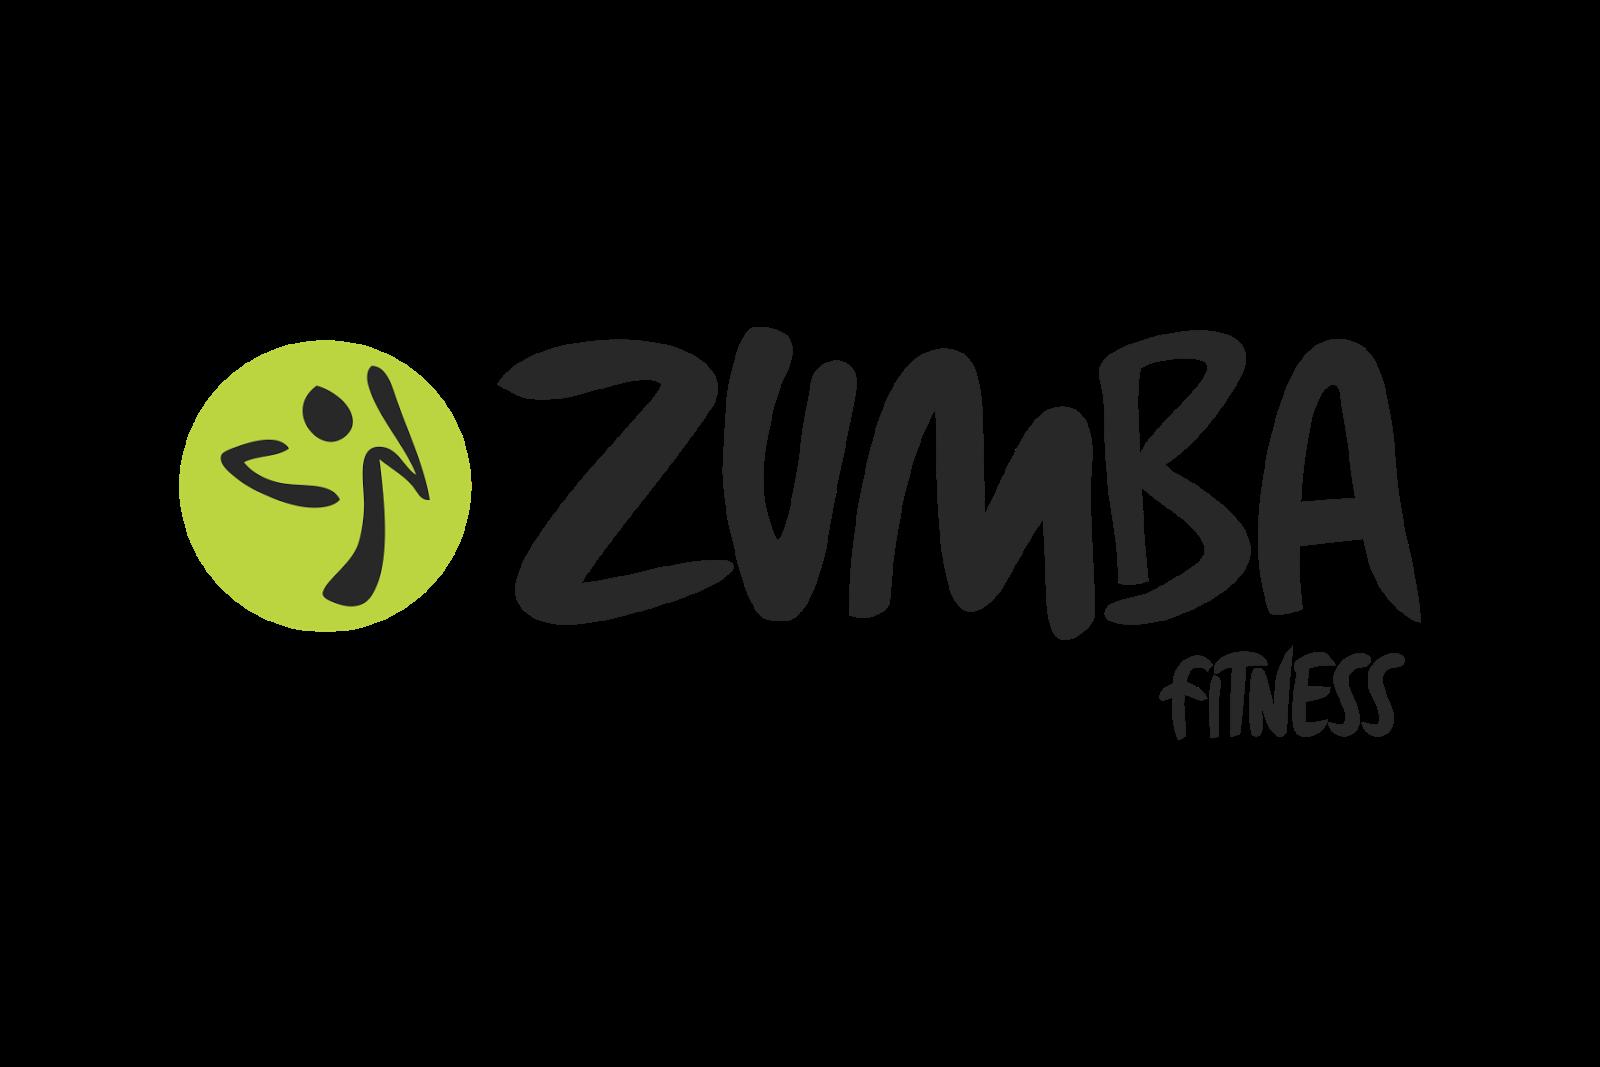 Zumba Fitness Vector Logo. »